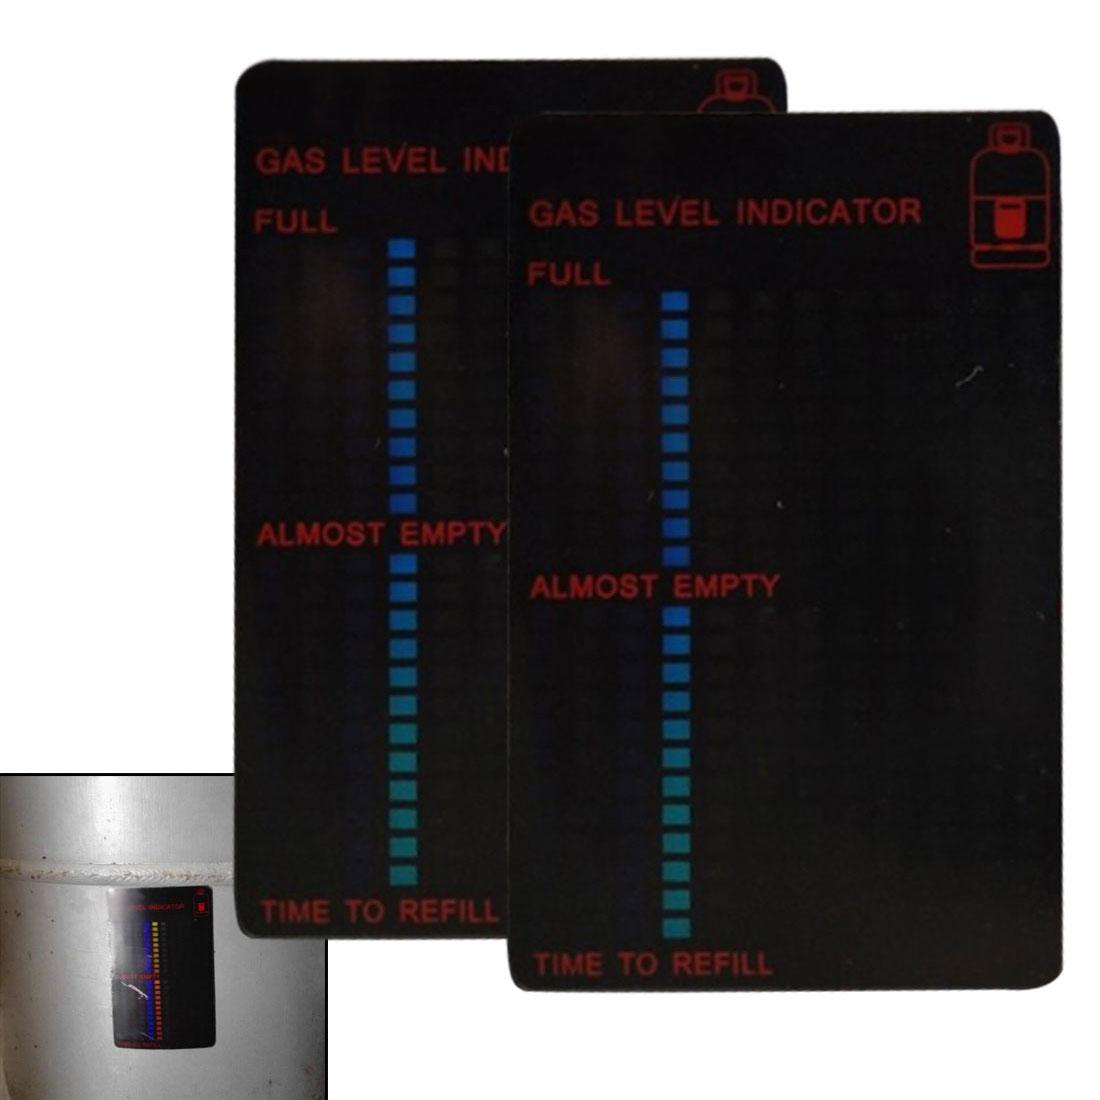 -10-120 Dreege Propane Butane Fuel Gas Tank Level Indicator Magnetic Gauge Caravan Bottle Temperature Measuring Stick